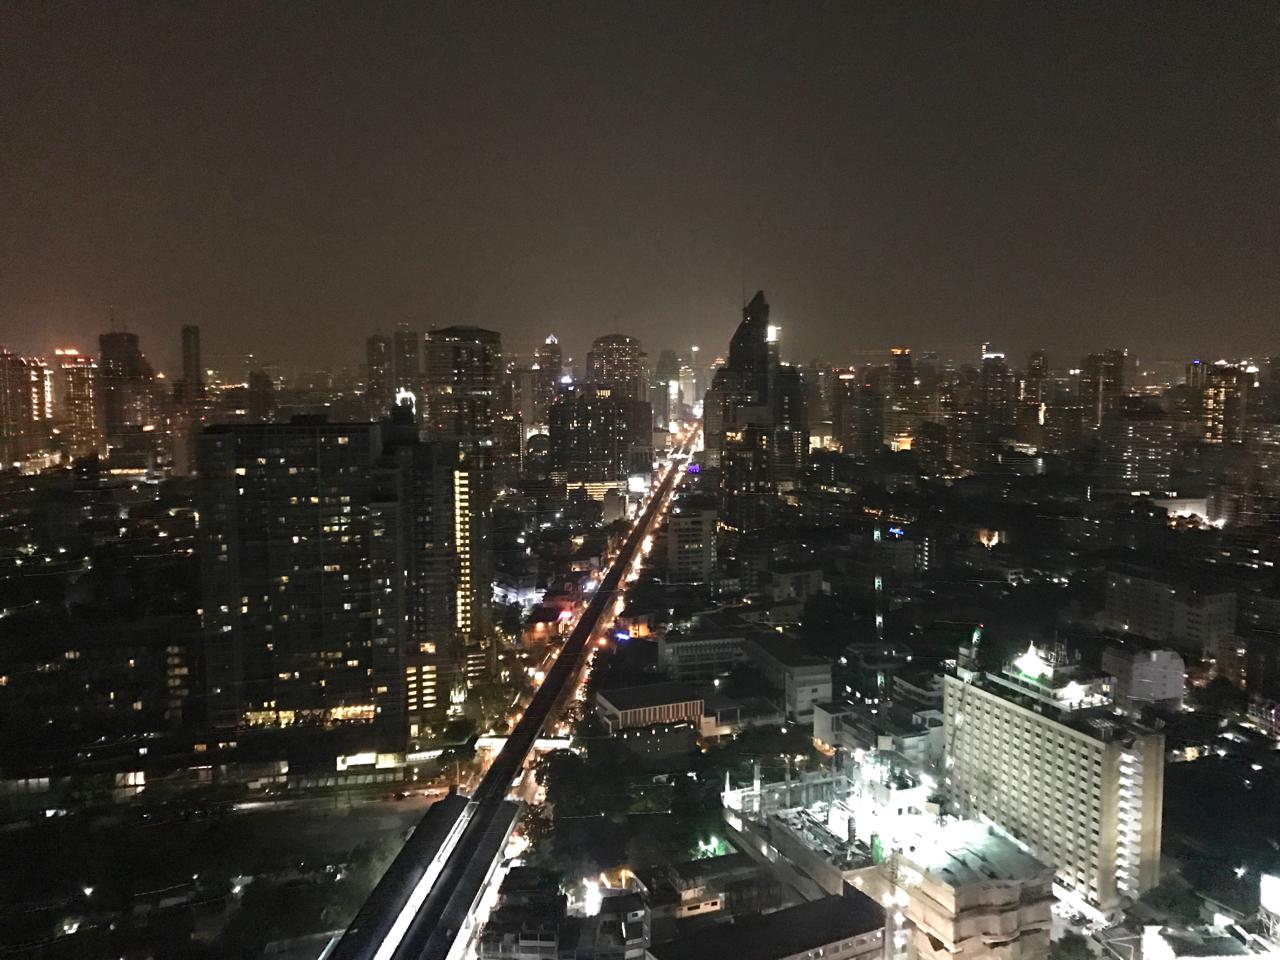 Bangkok Marriott Sukhumvit Hotel rooftop bar view